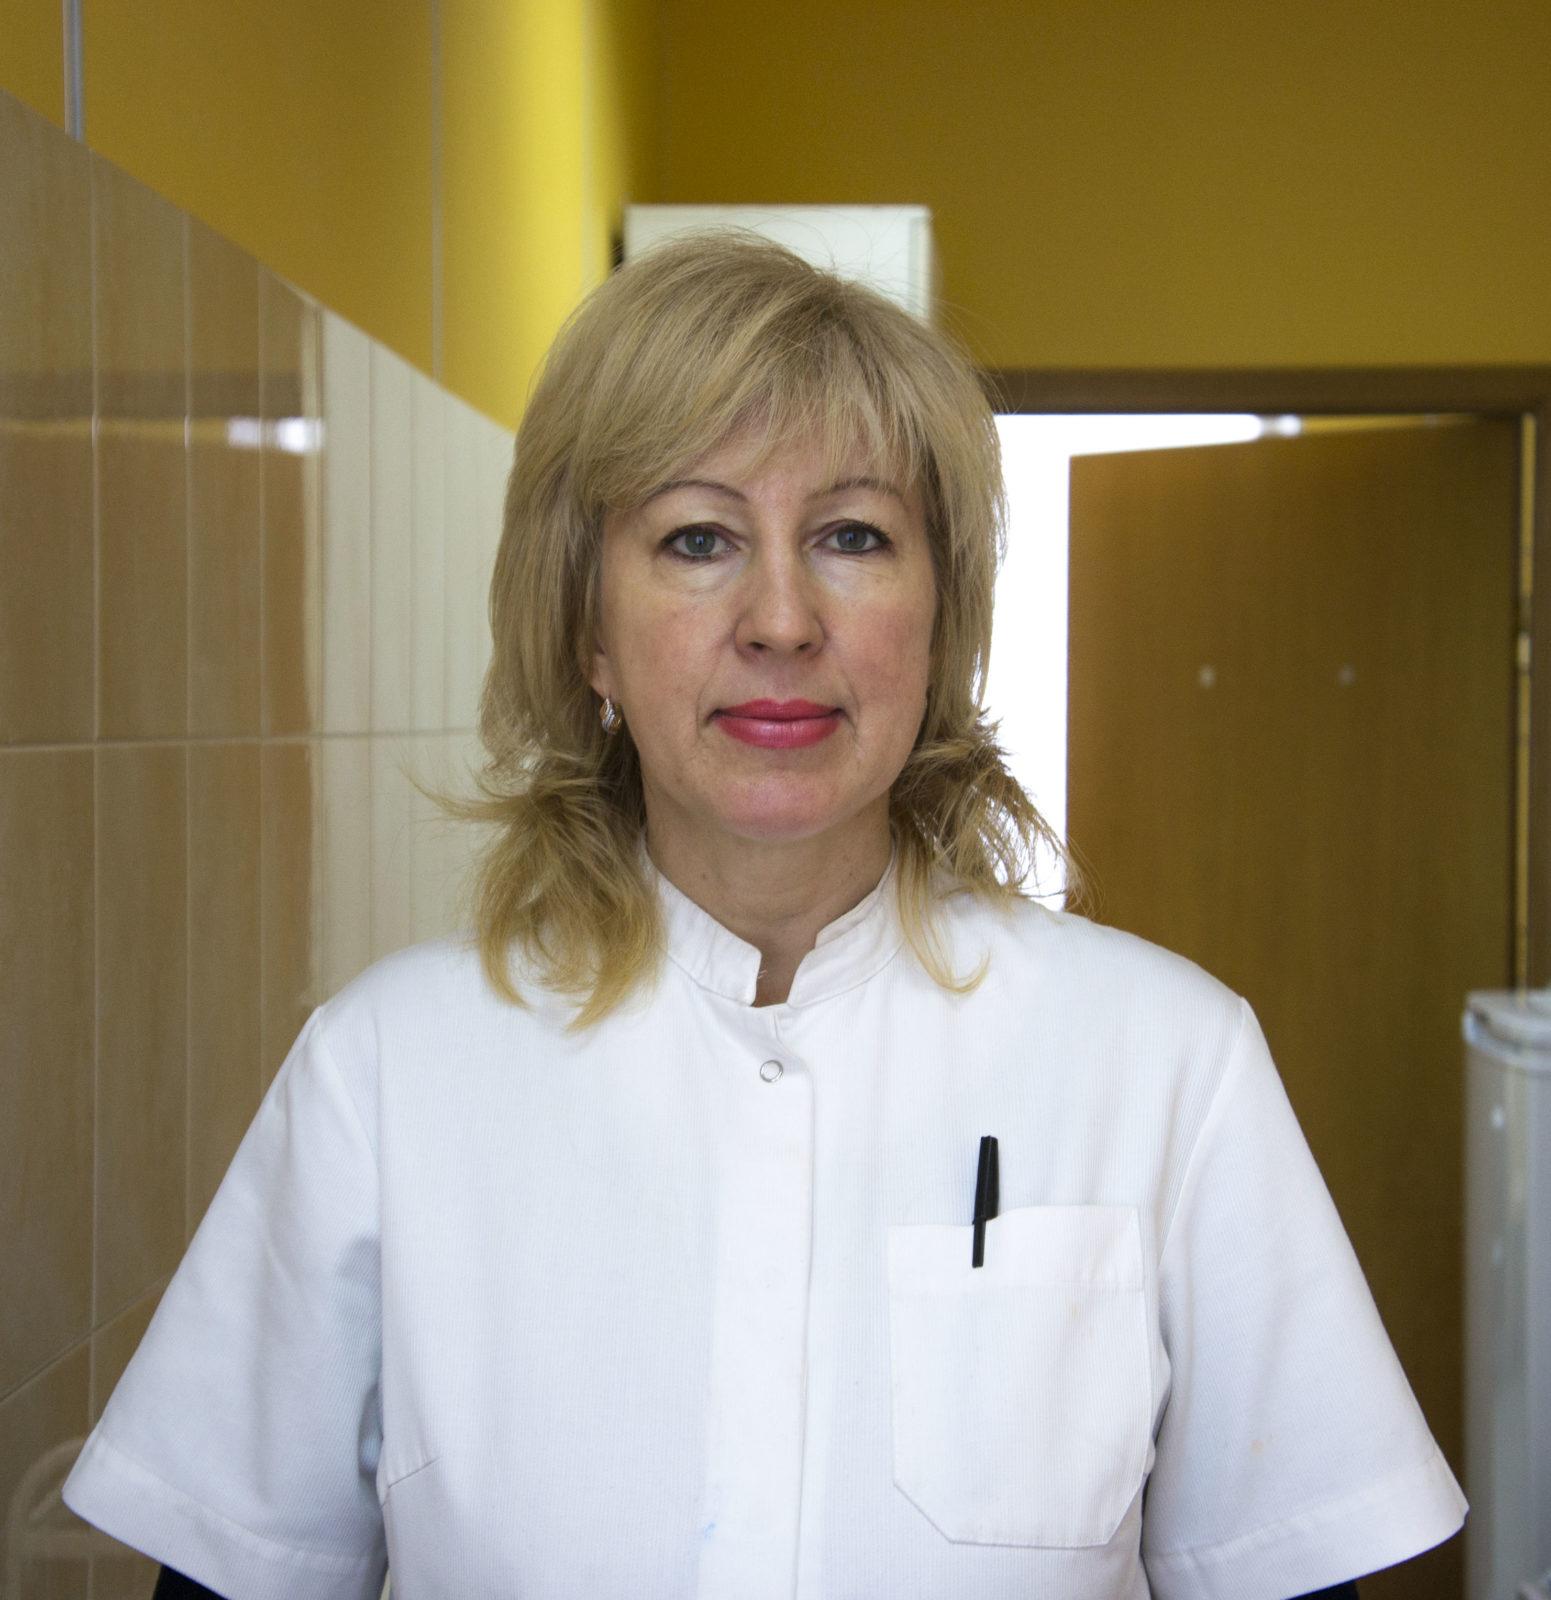 Фельчагина Татьяна Юрьевна